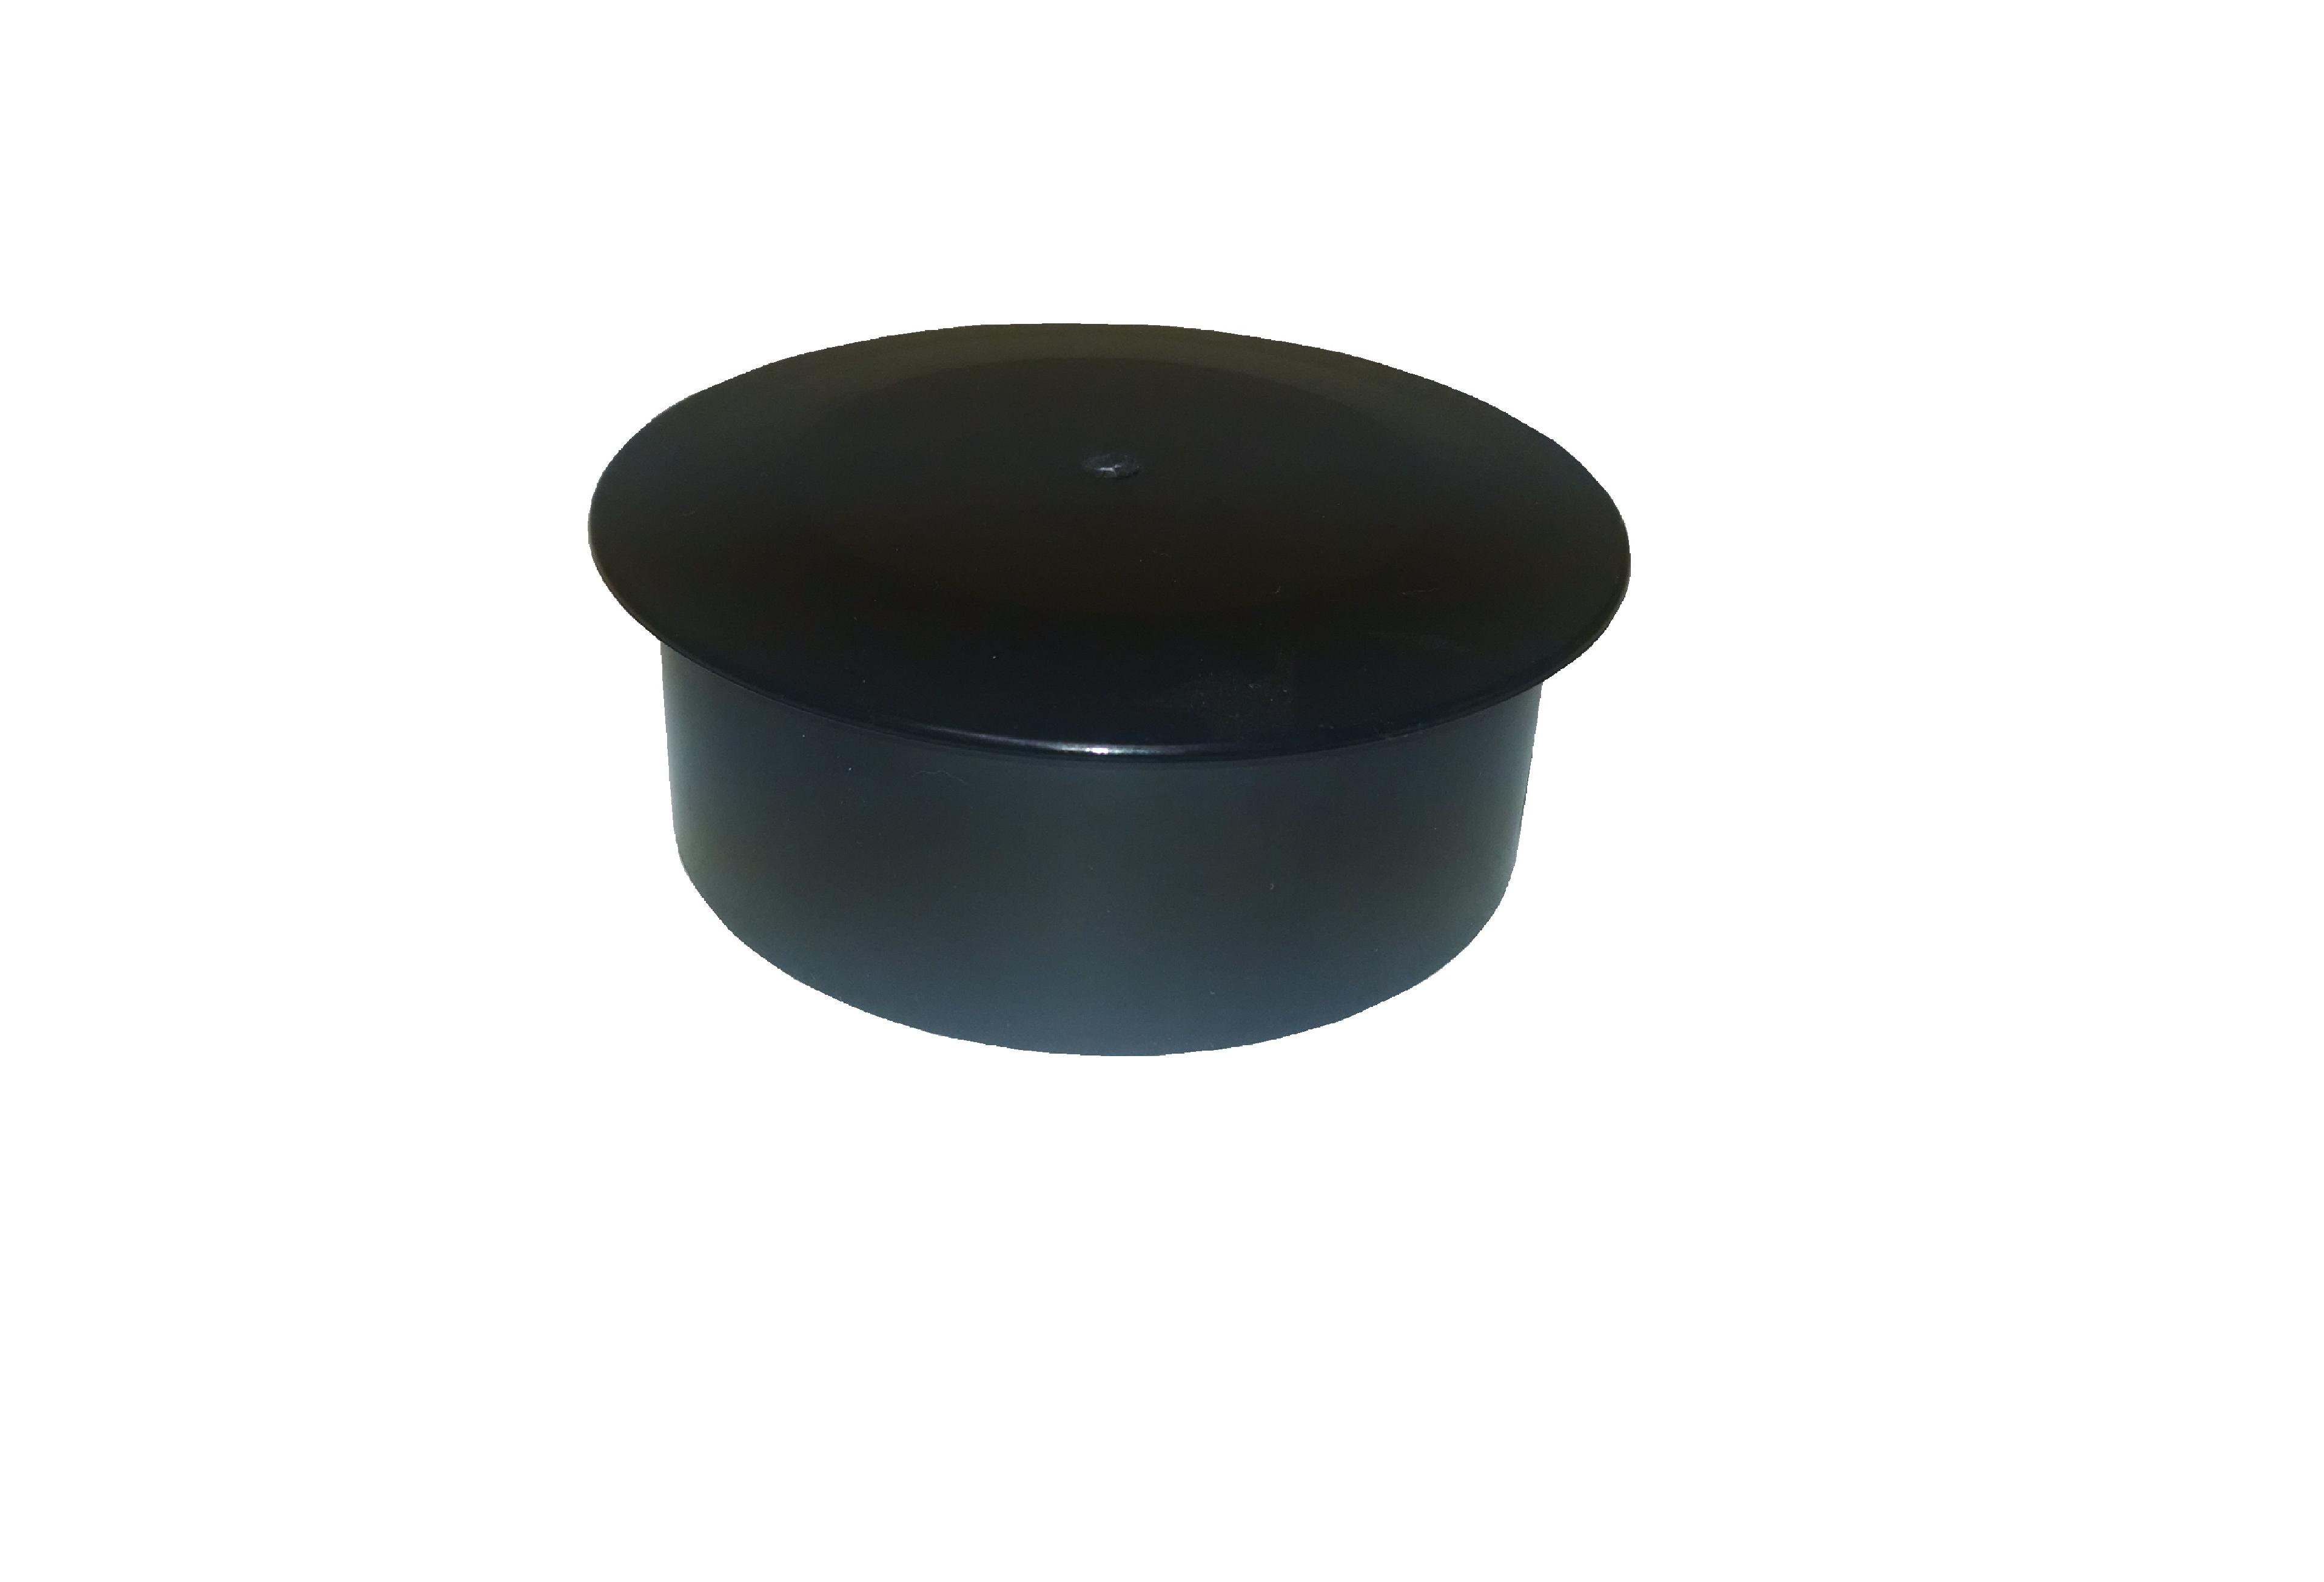 Base 1 2 3 Plug Inch Base Inch Top